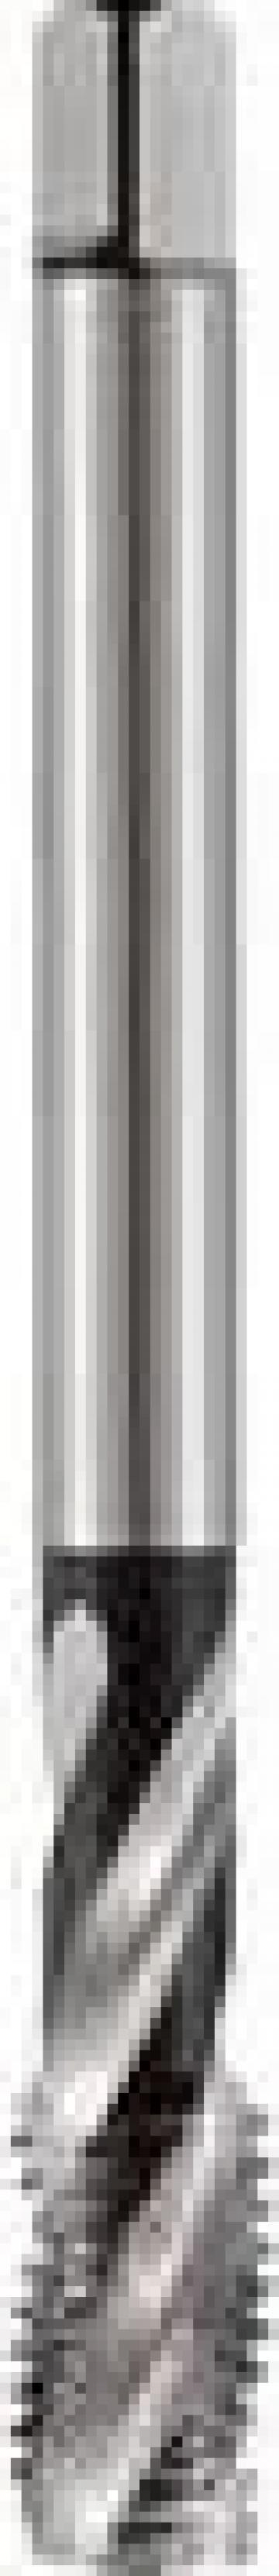 Tarod universal de masina 1017-039 de la Nascom Invest